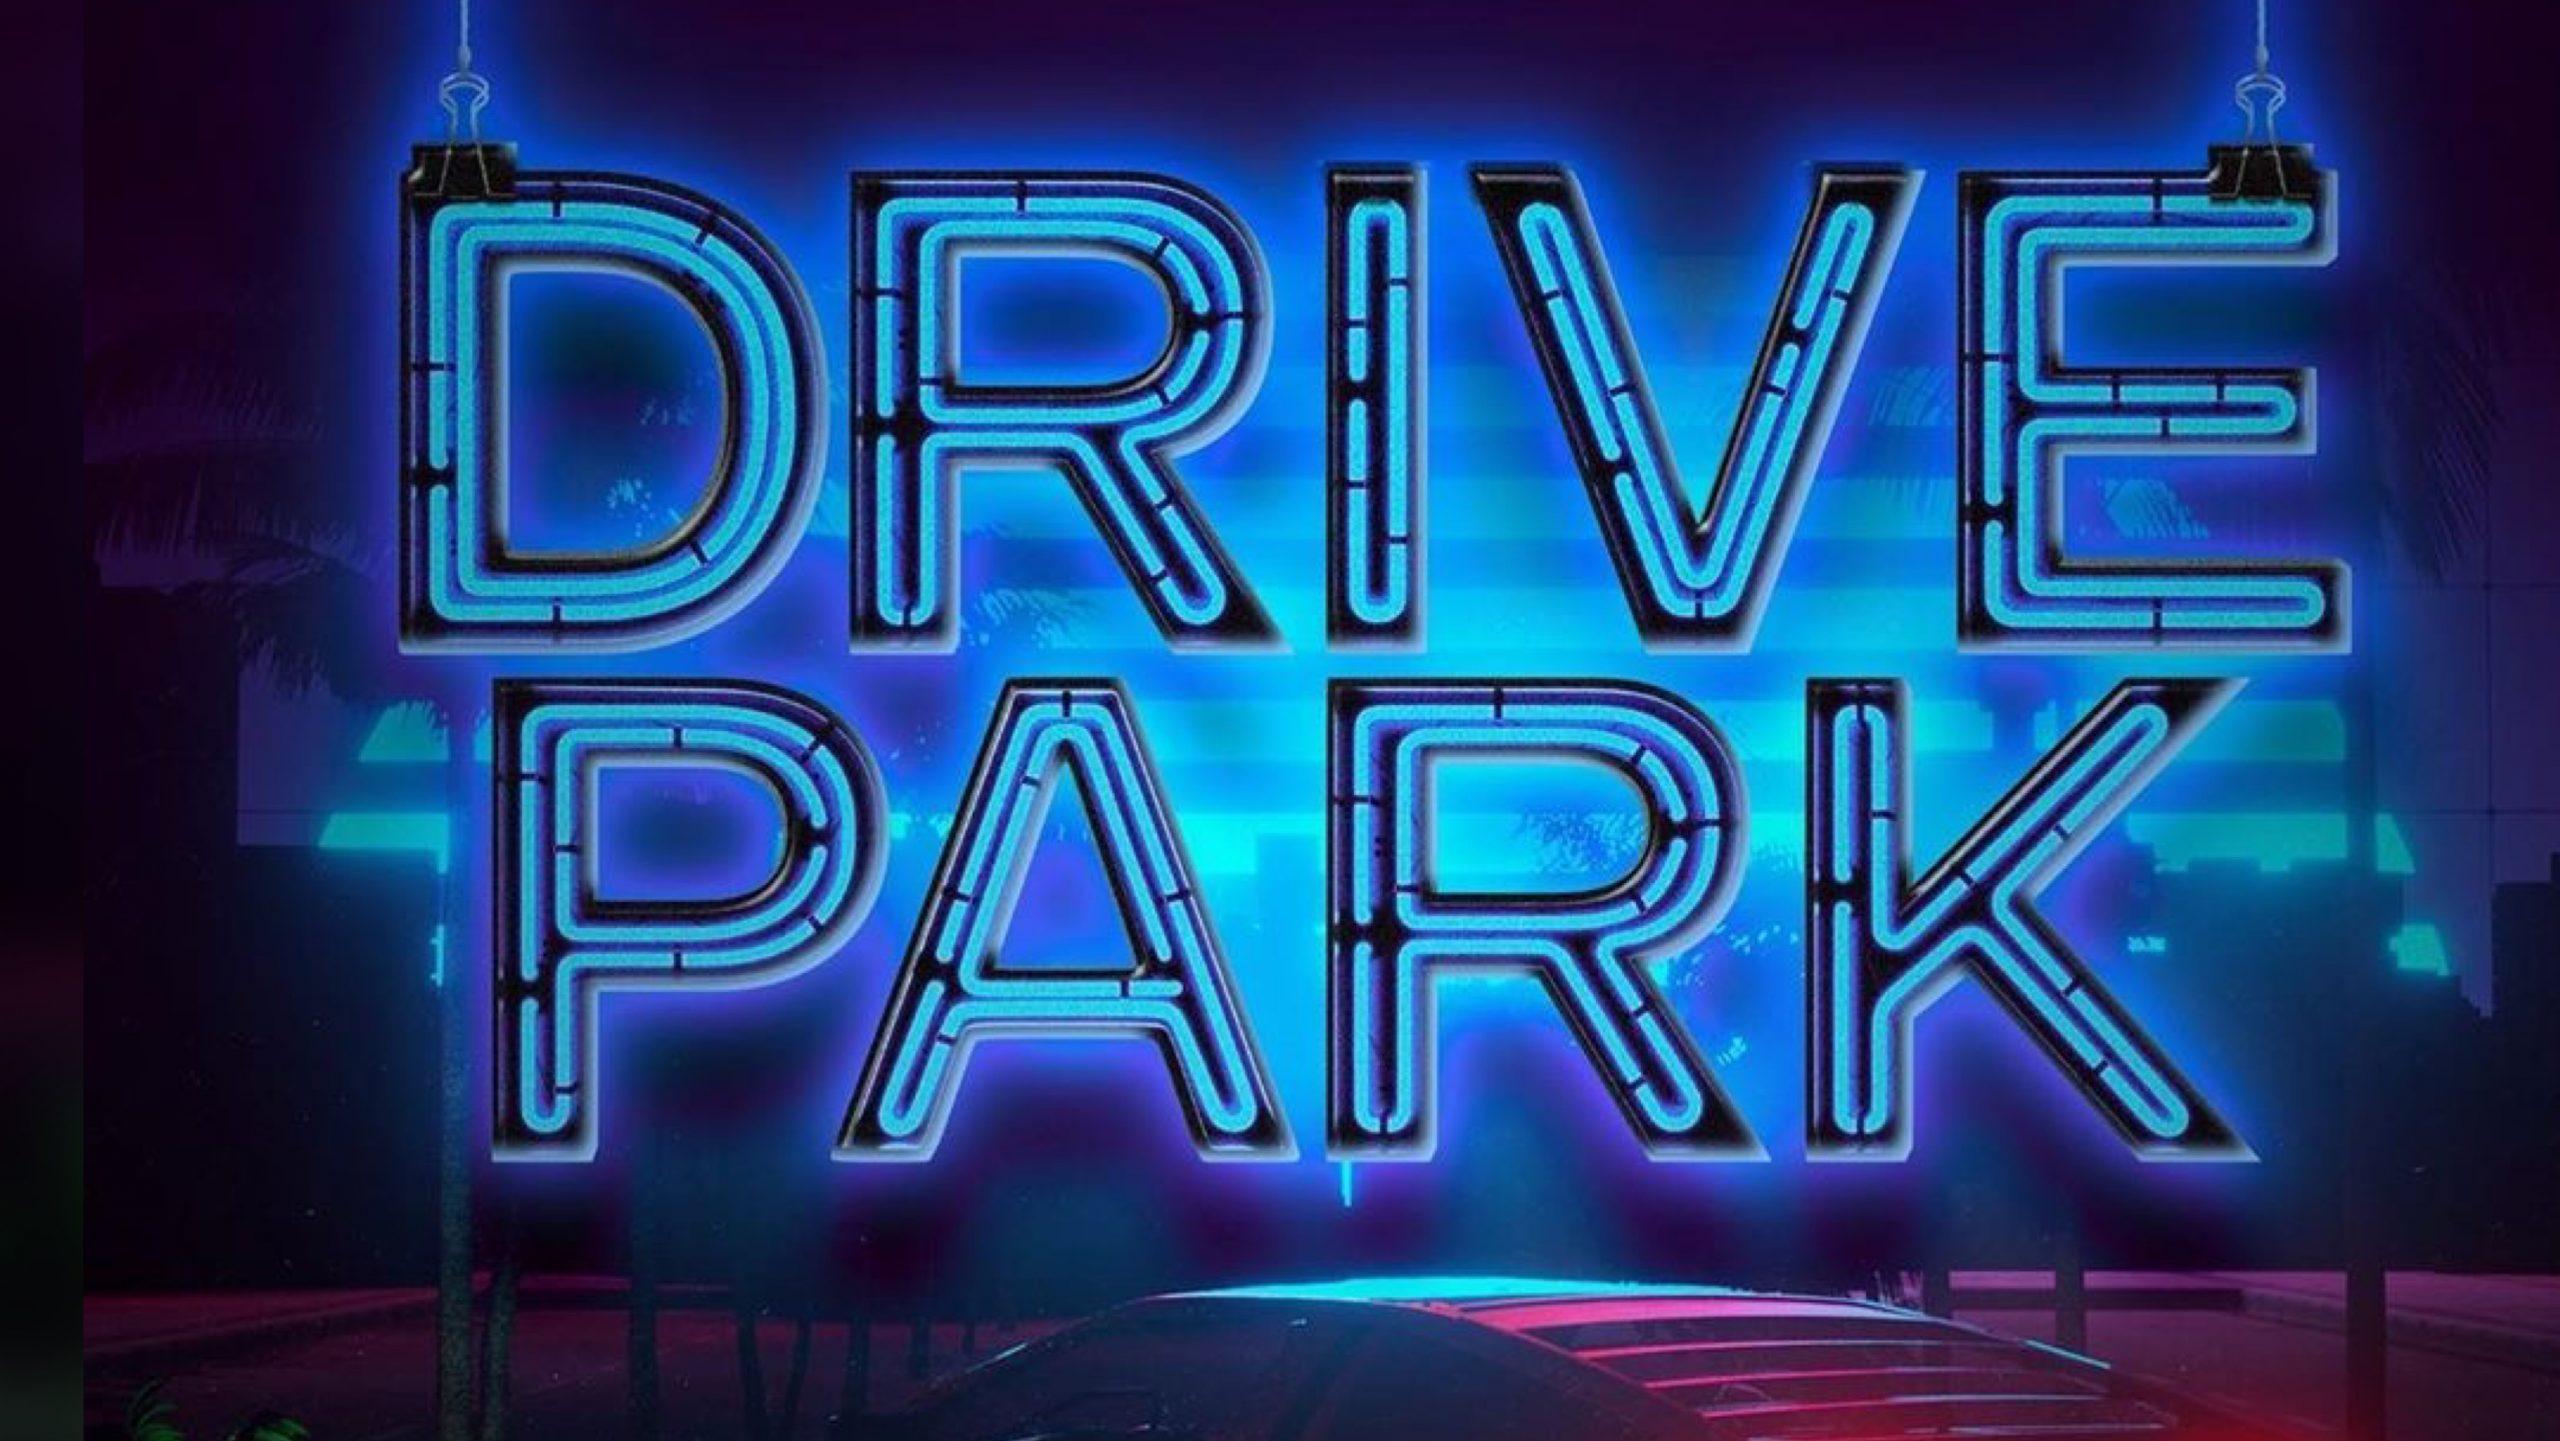 Music Park em Jurerê Internacional de Florianópolis, irá inaugurar Drive-in